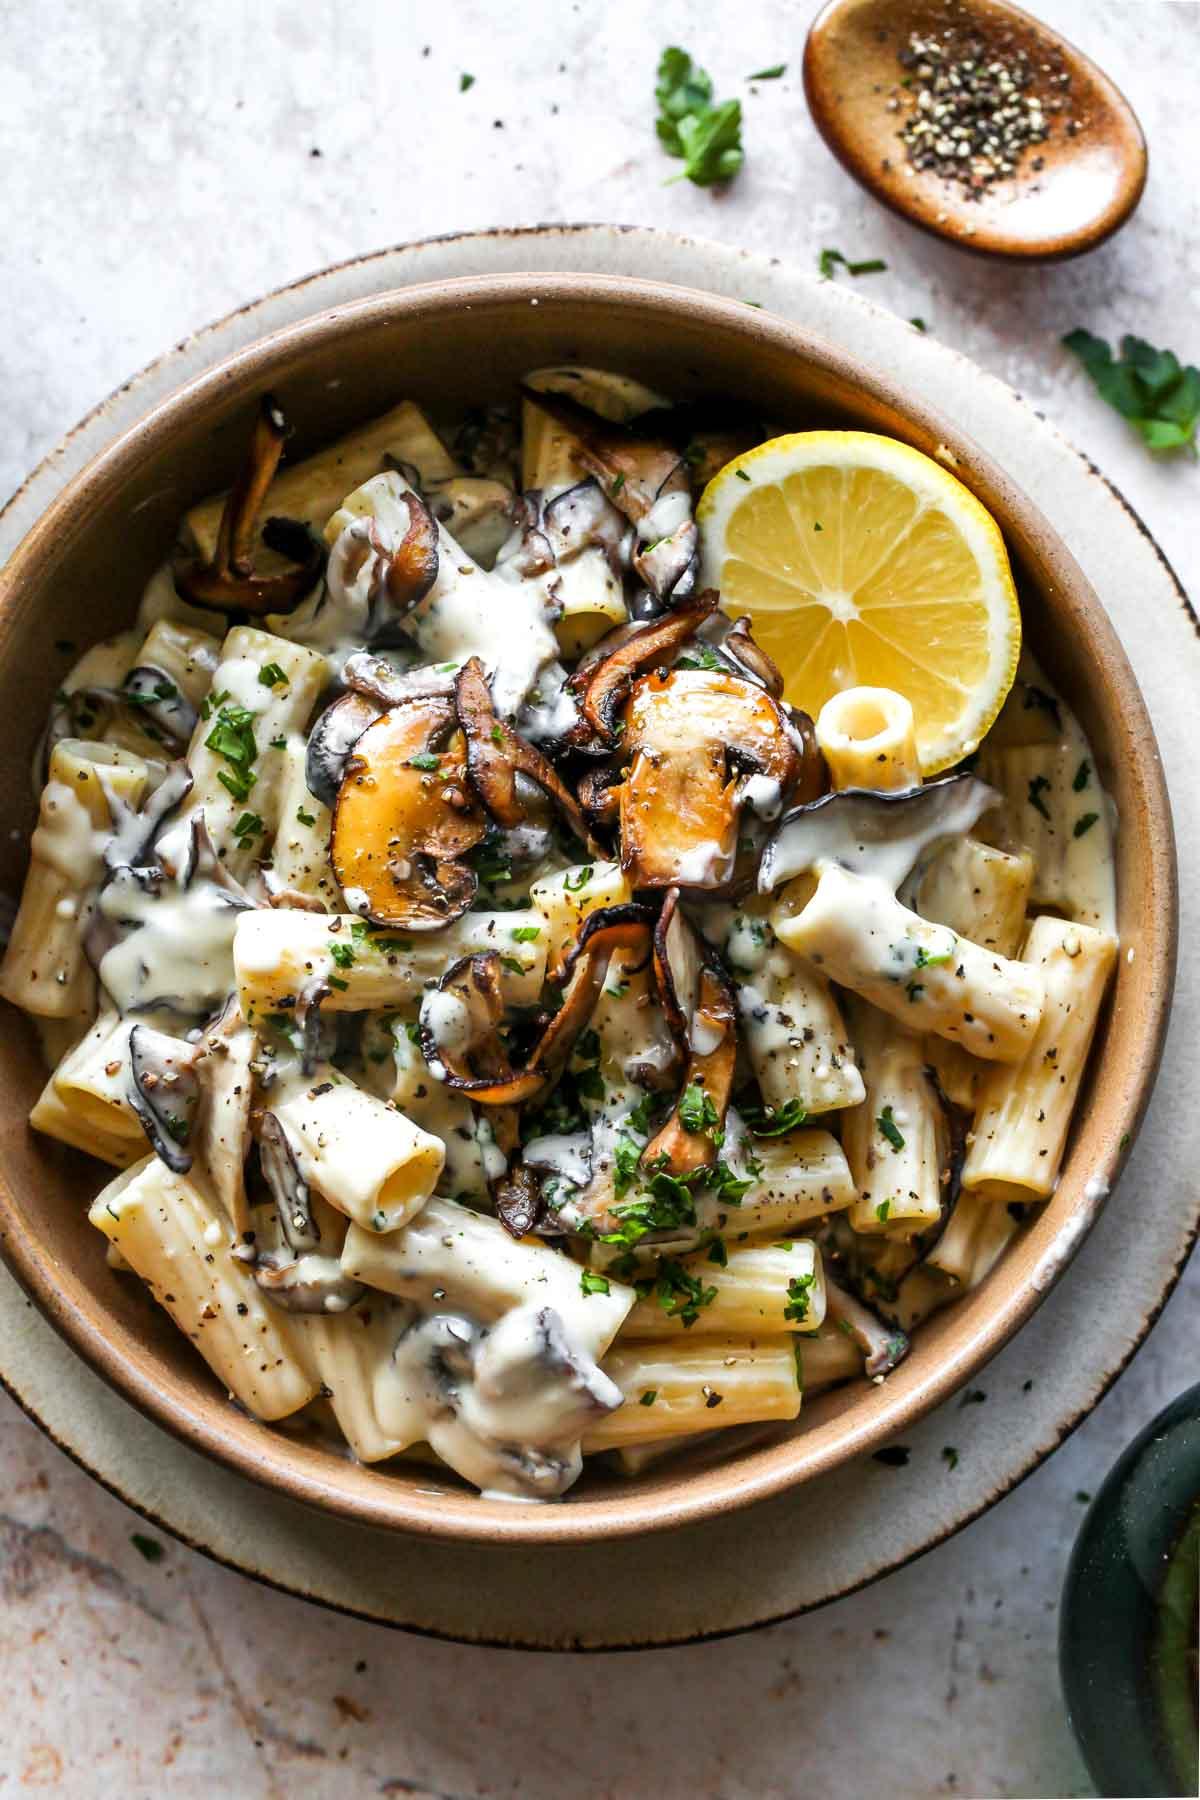 Mushroom pasta in a gold bowl with creamy vegan sauce